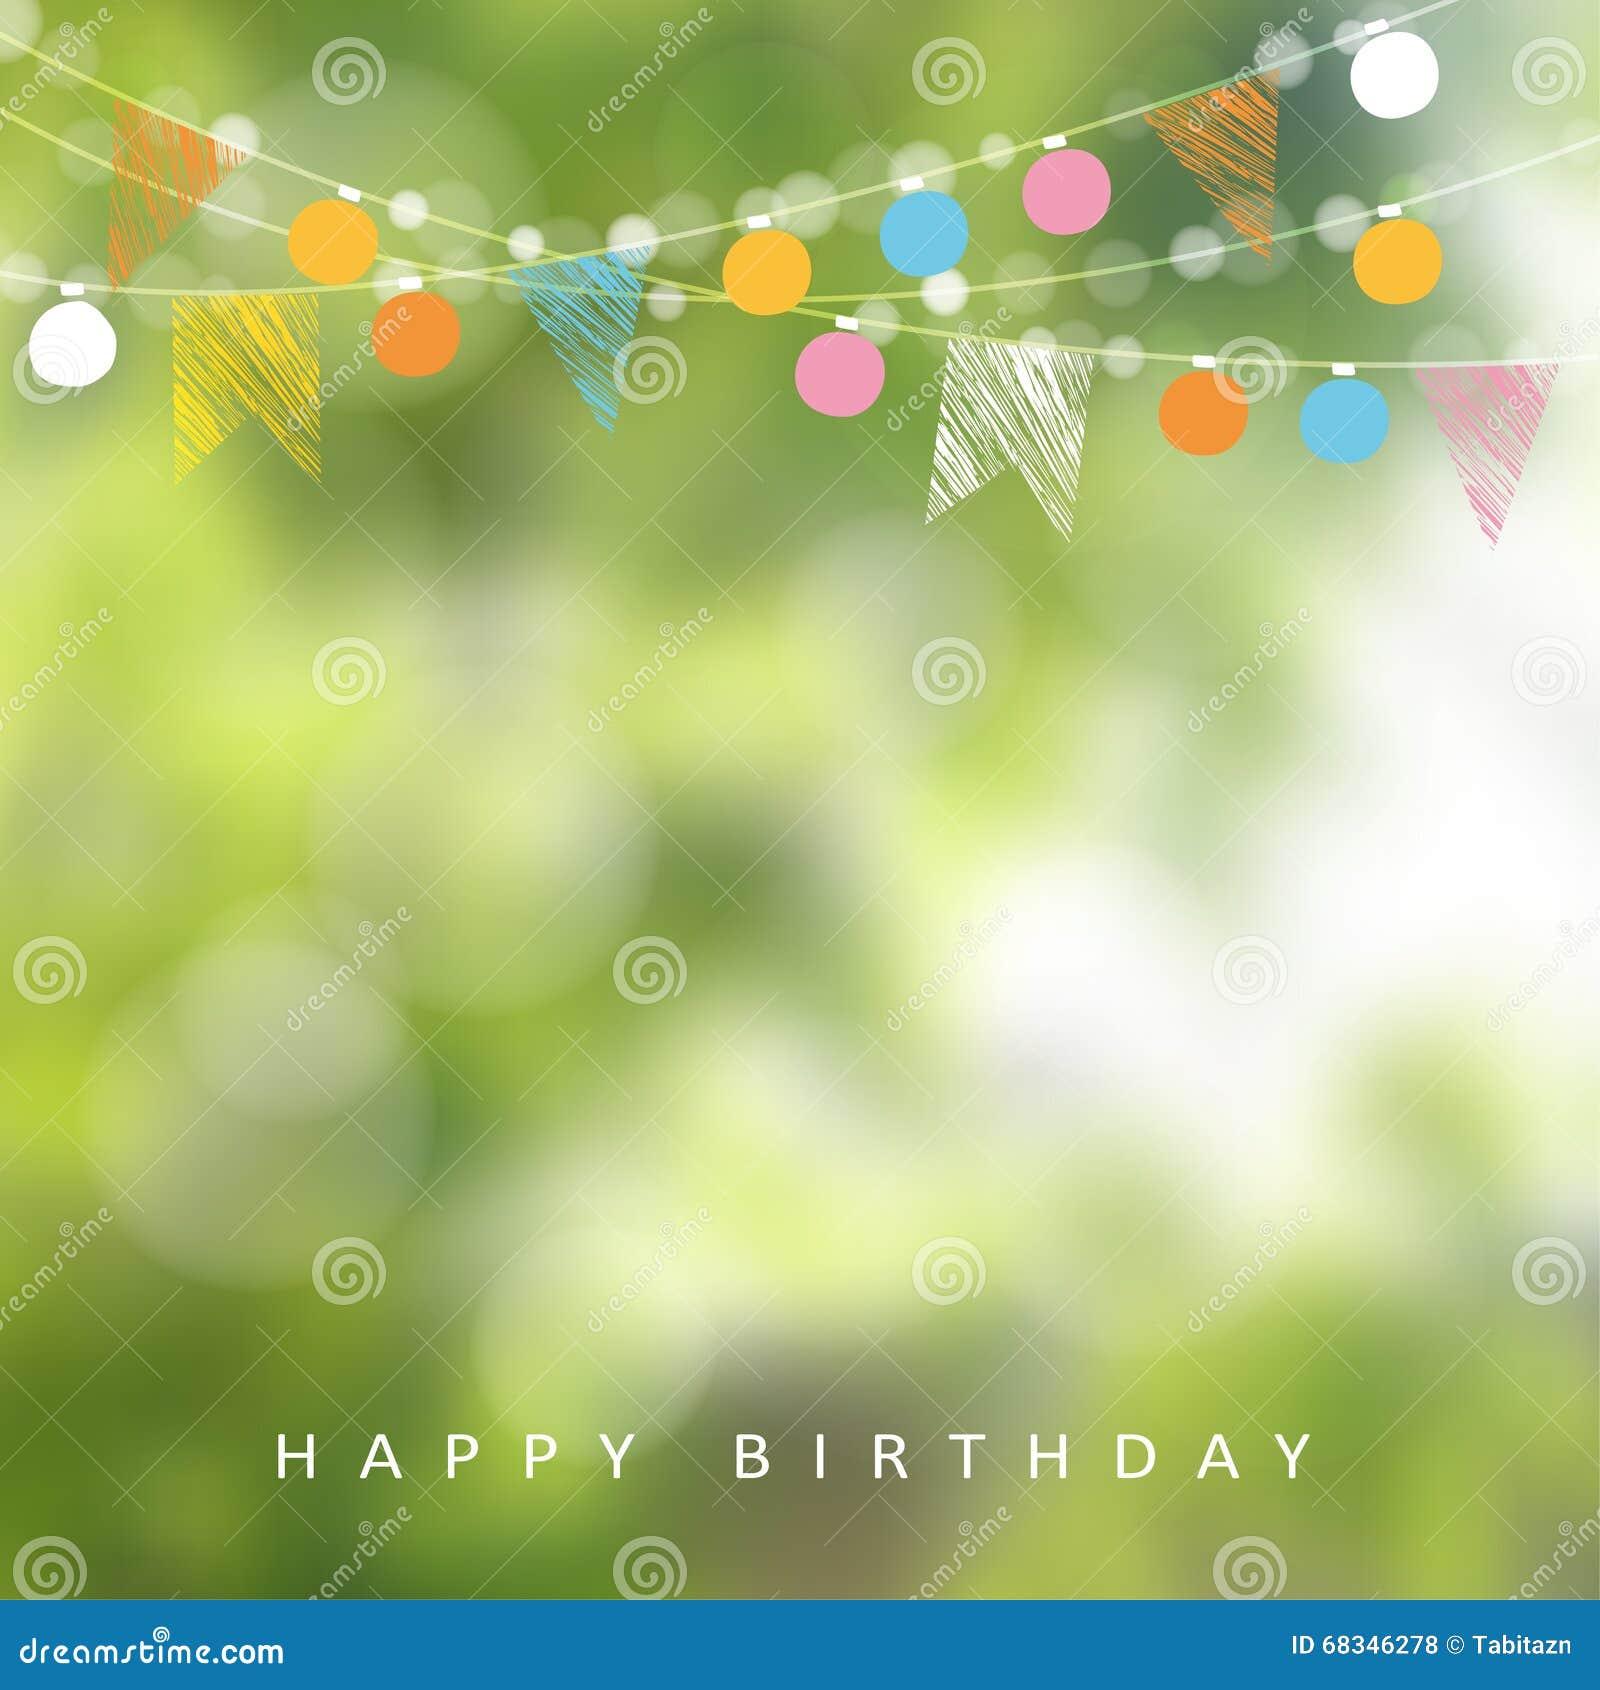 birthday garden party or brazilian june party happy birthday clip art for men cousins happy birthday clip art for men cousins